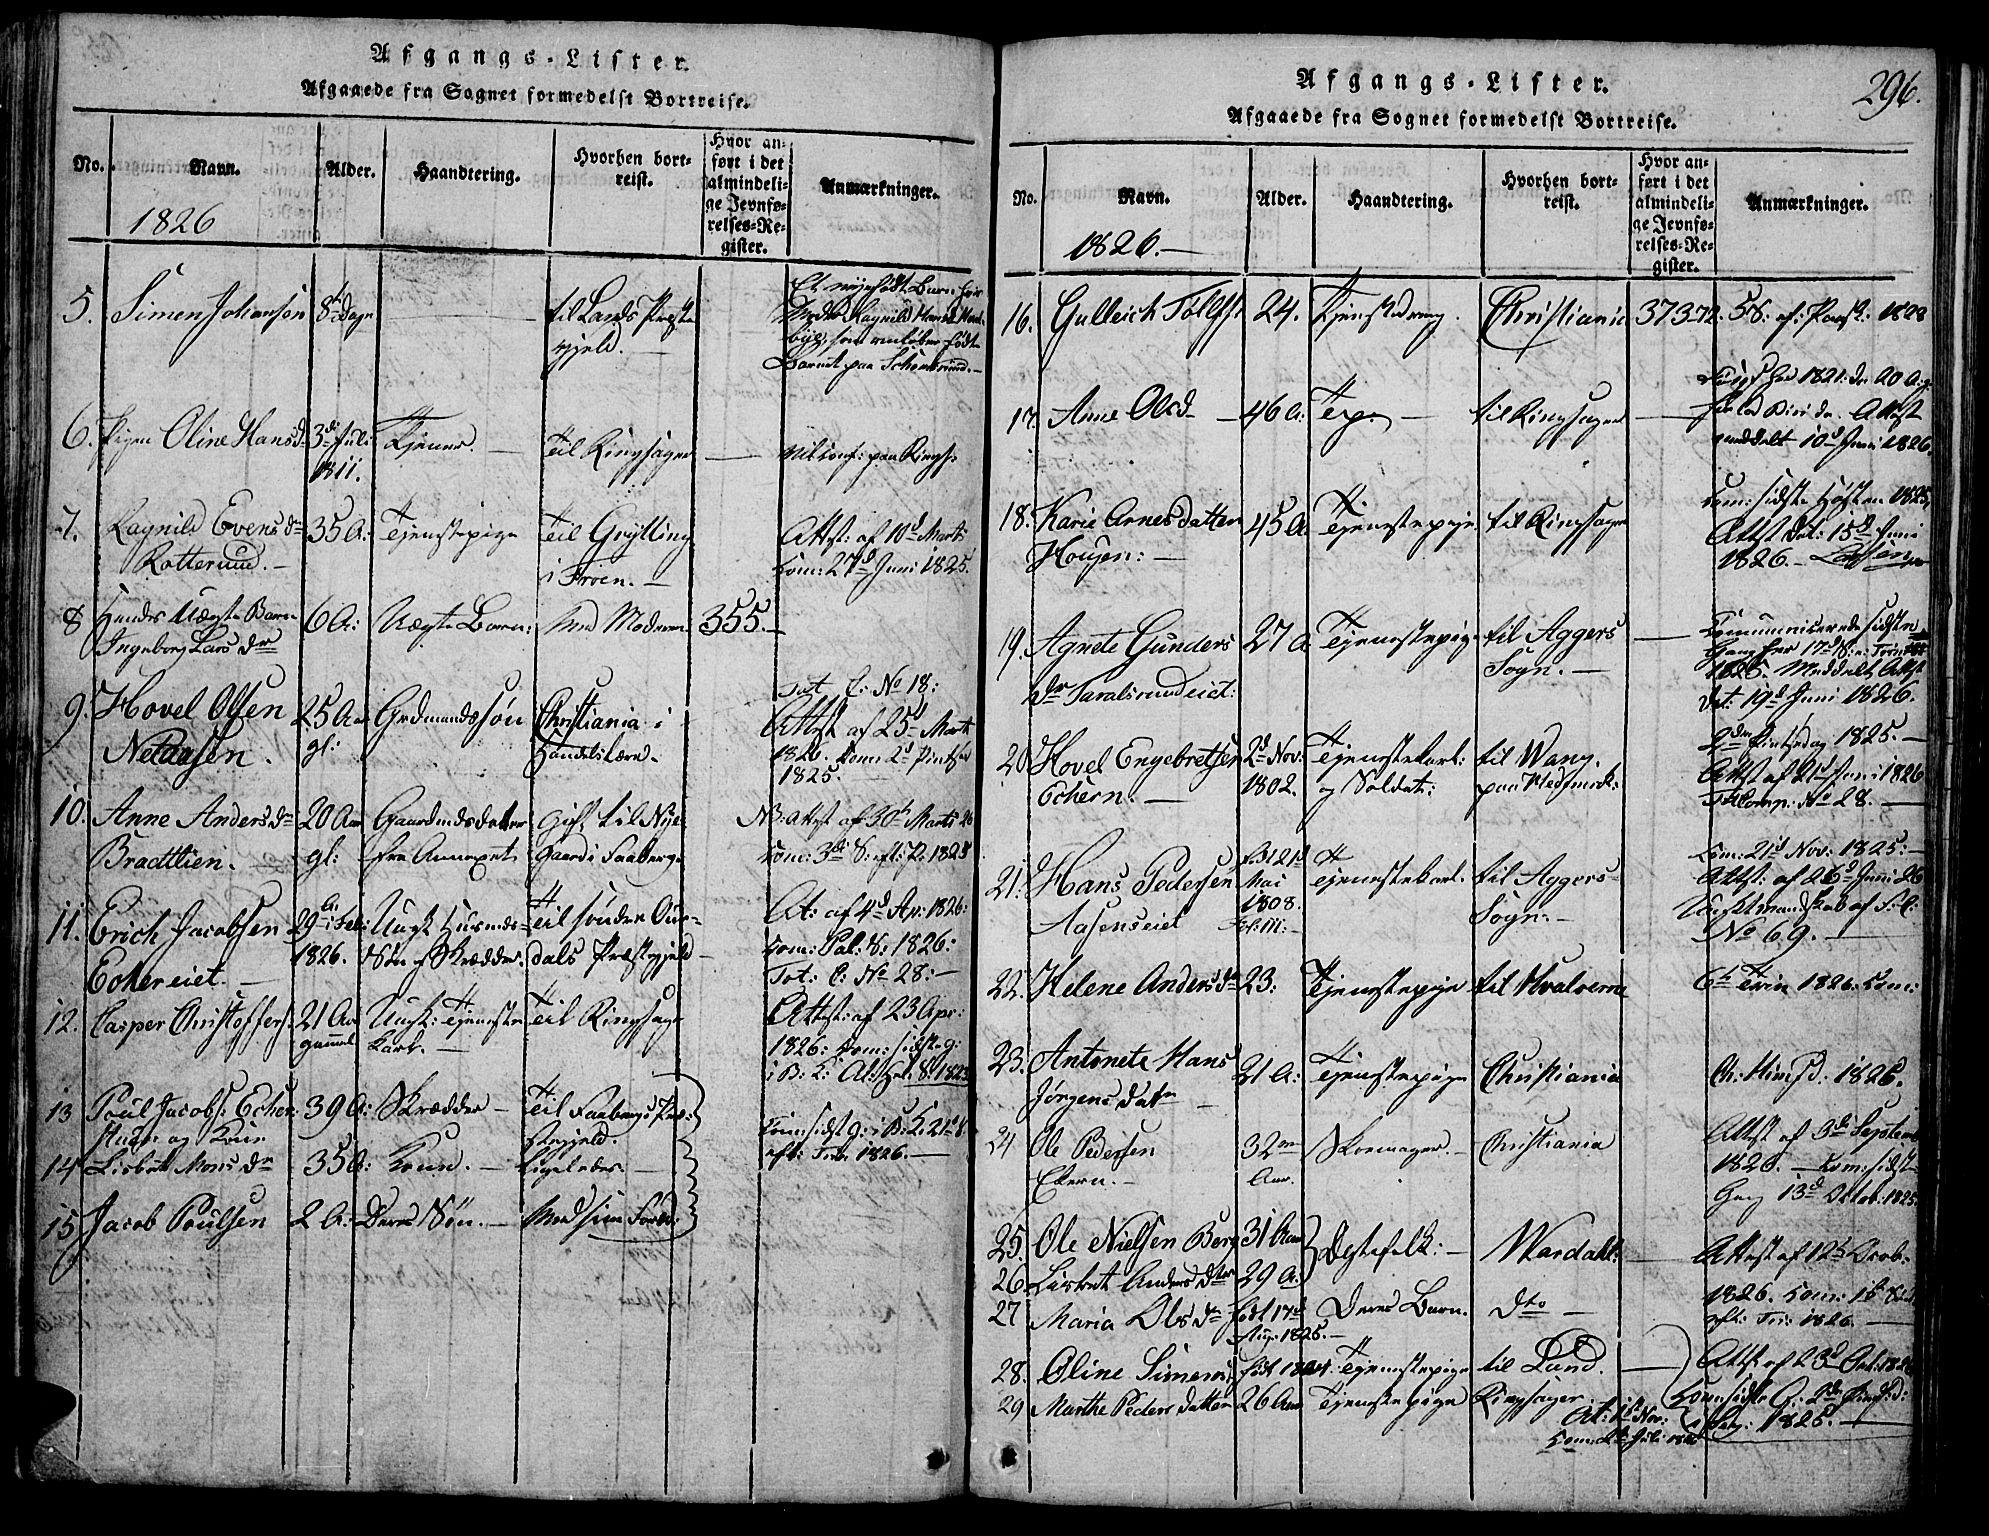 SAH, Biri prestekontor, Klokkerbok nr. 1, 1814-1828, s. 296